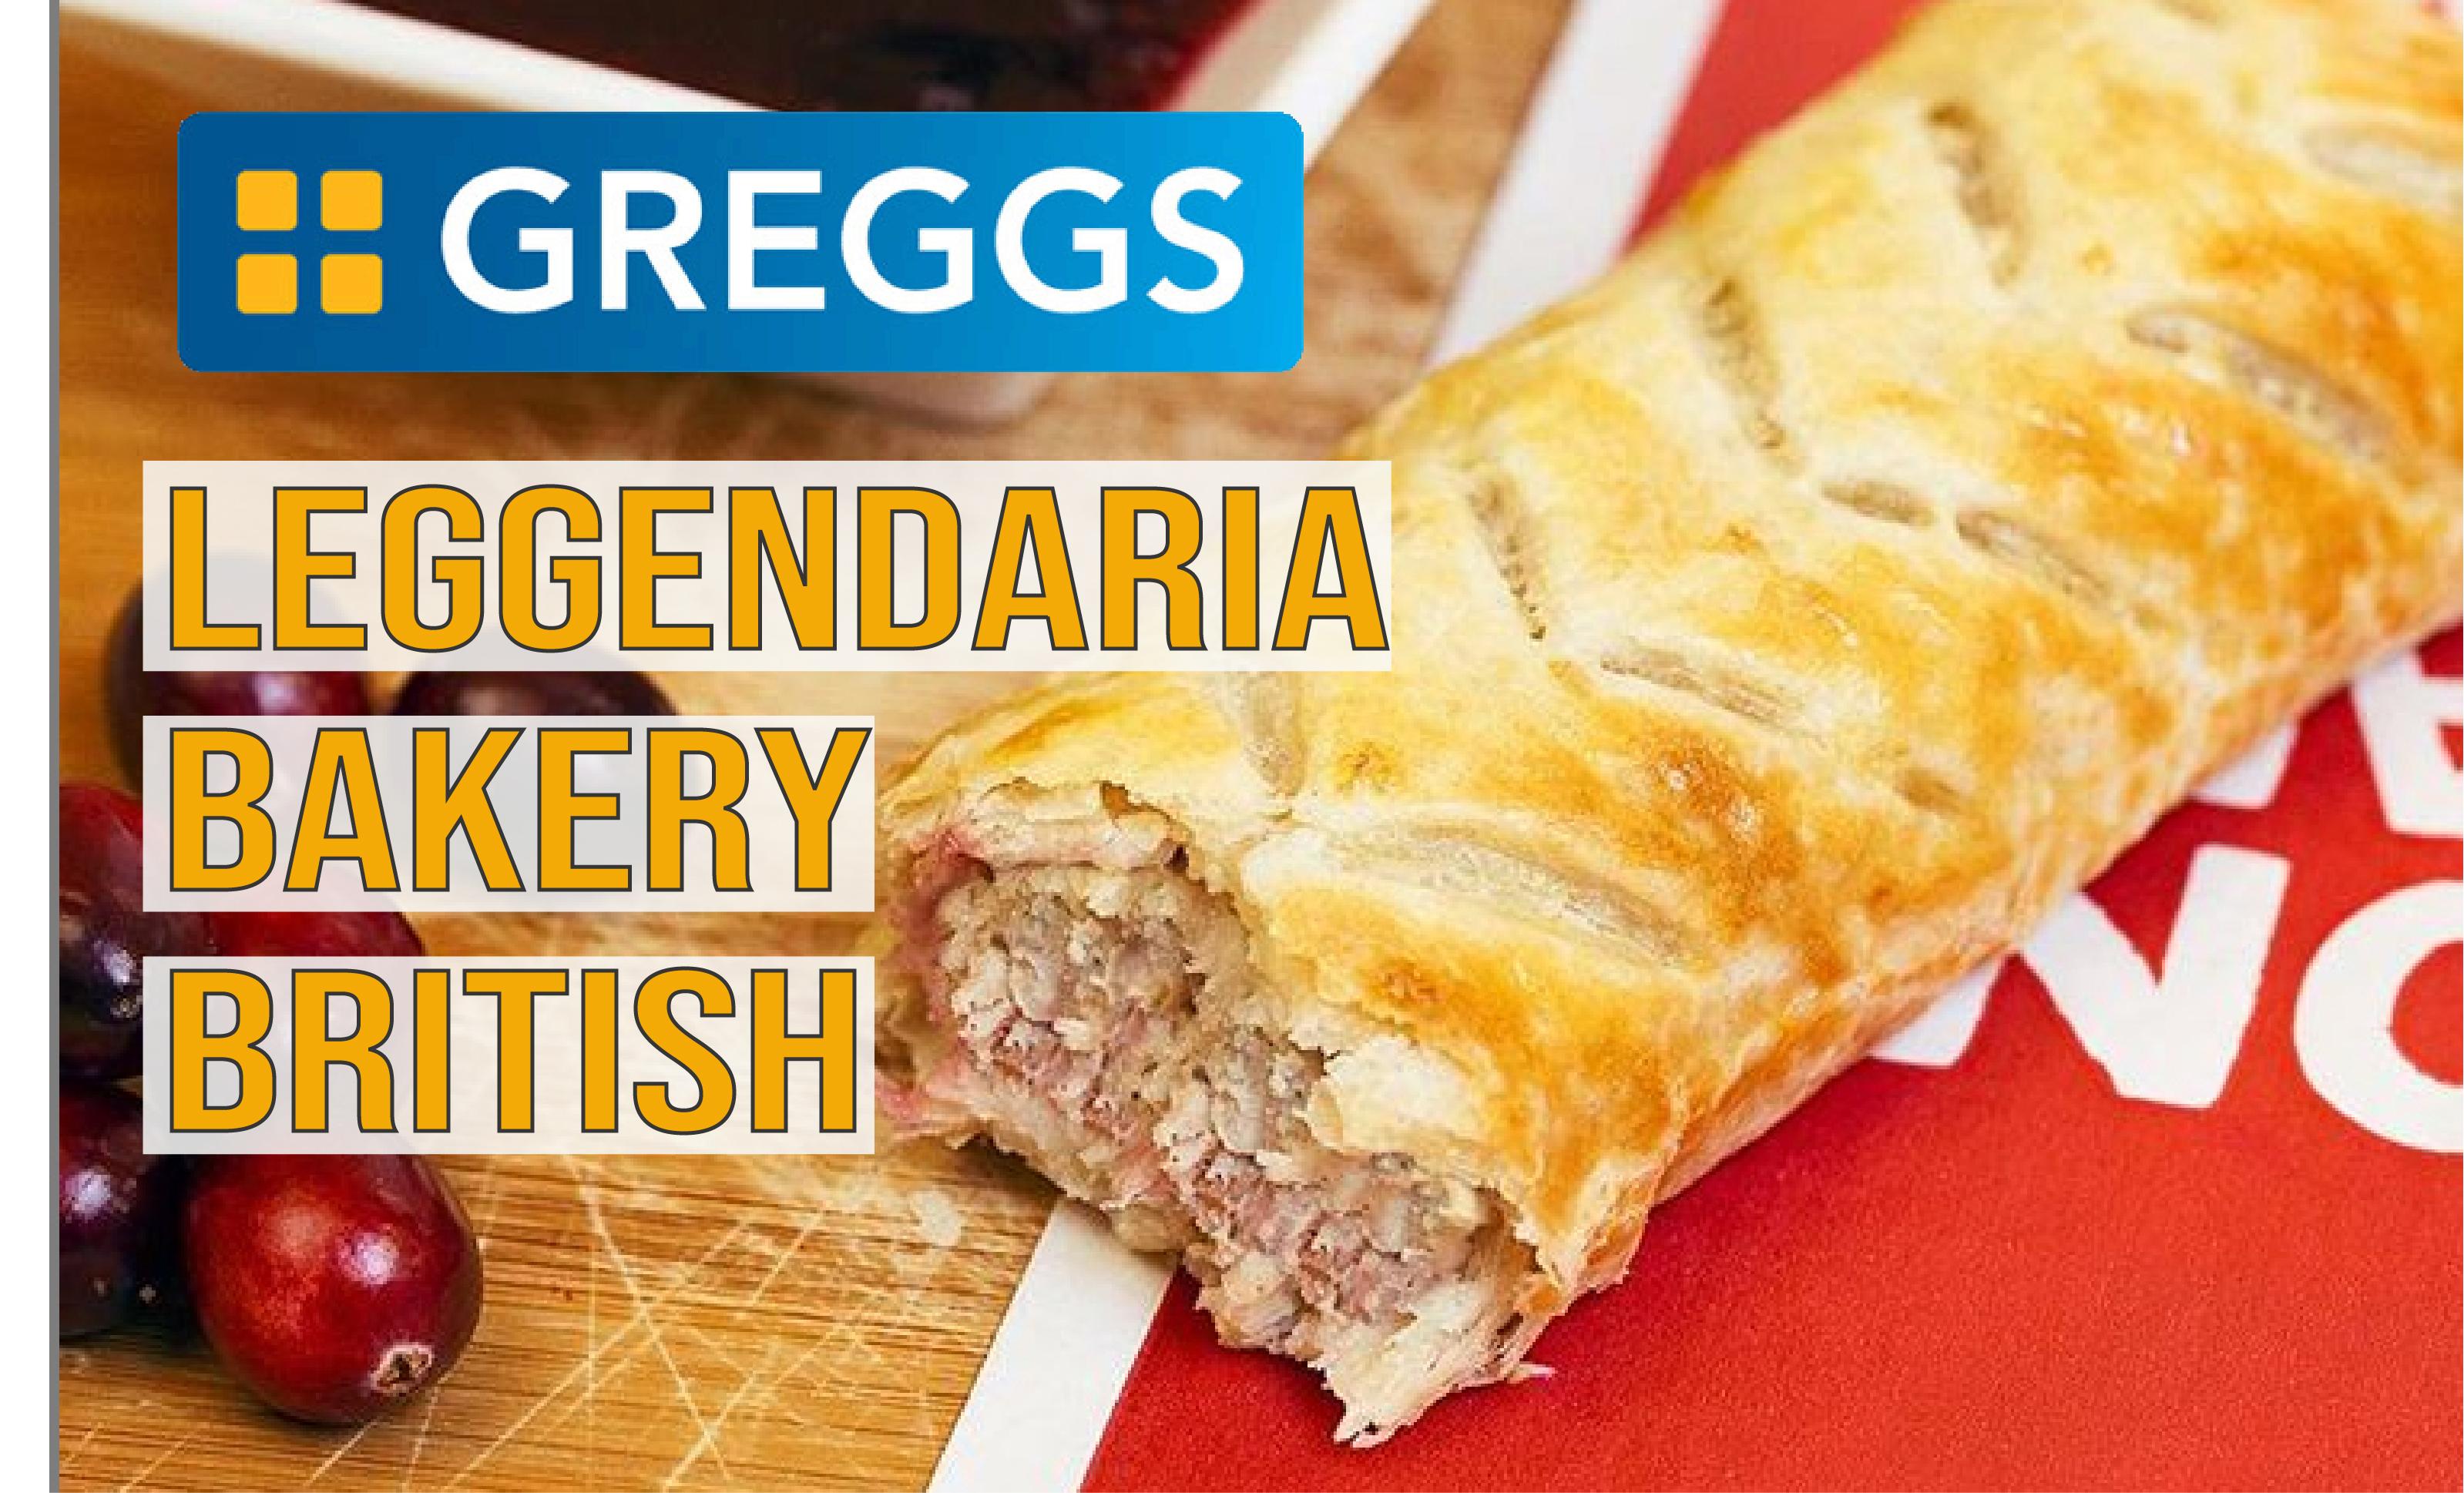 Greggs. Leggendaria Bakery British